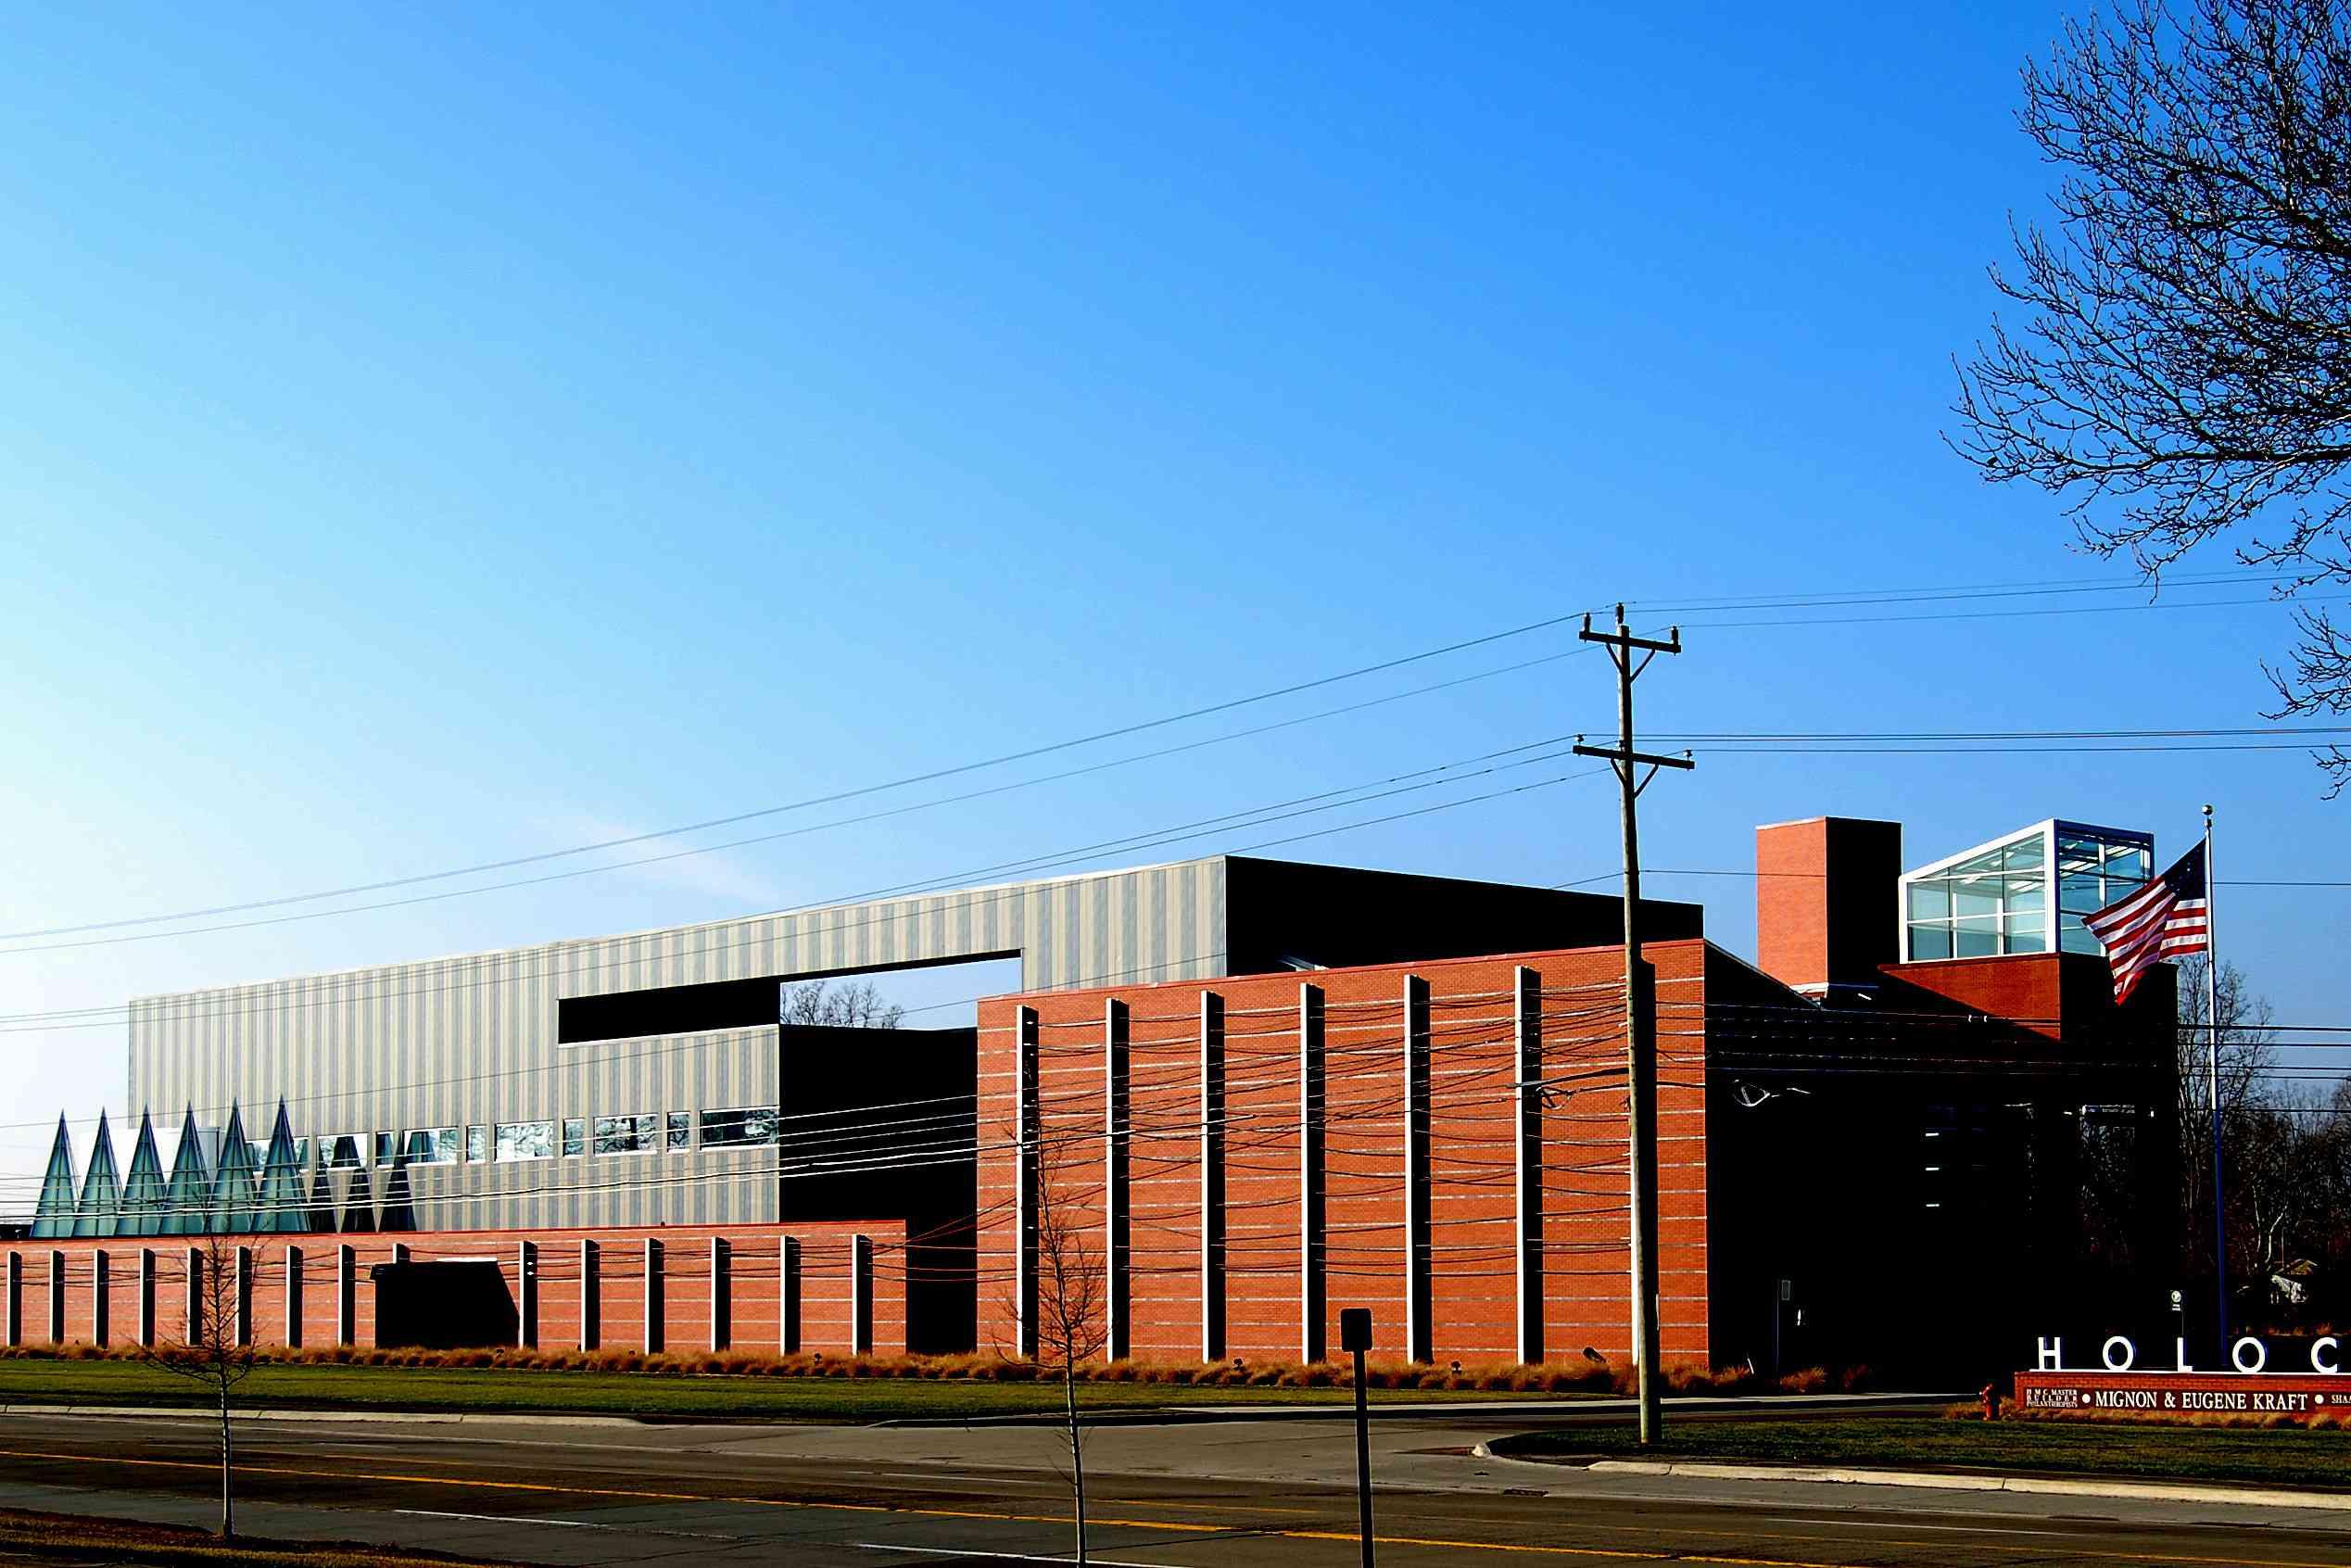 Holocaust Memorial Center in Farmington michigan